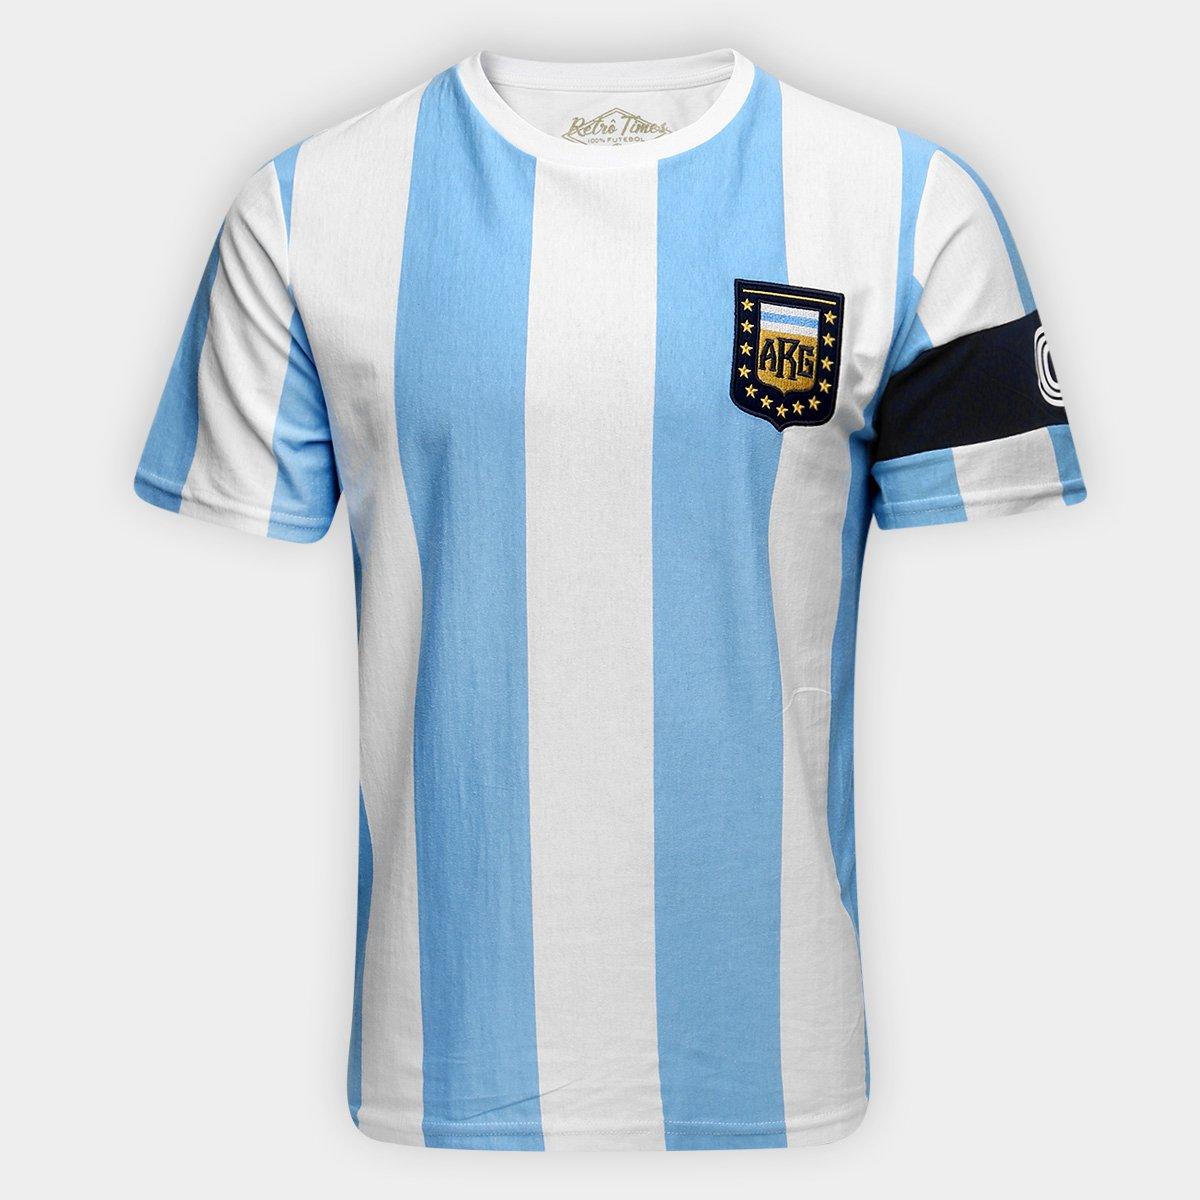 03a0328e63 Camiseta Argentina Capitães 1986 Retrô Times Masculina - Compre ...